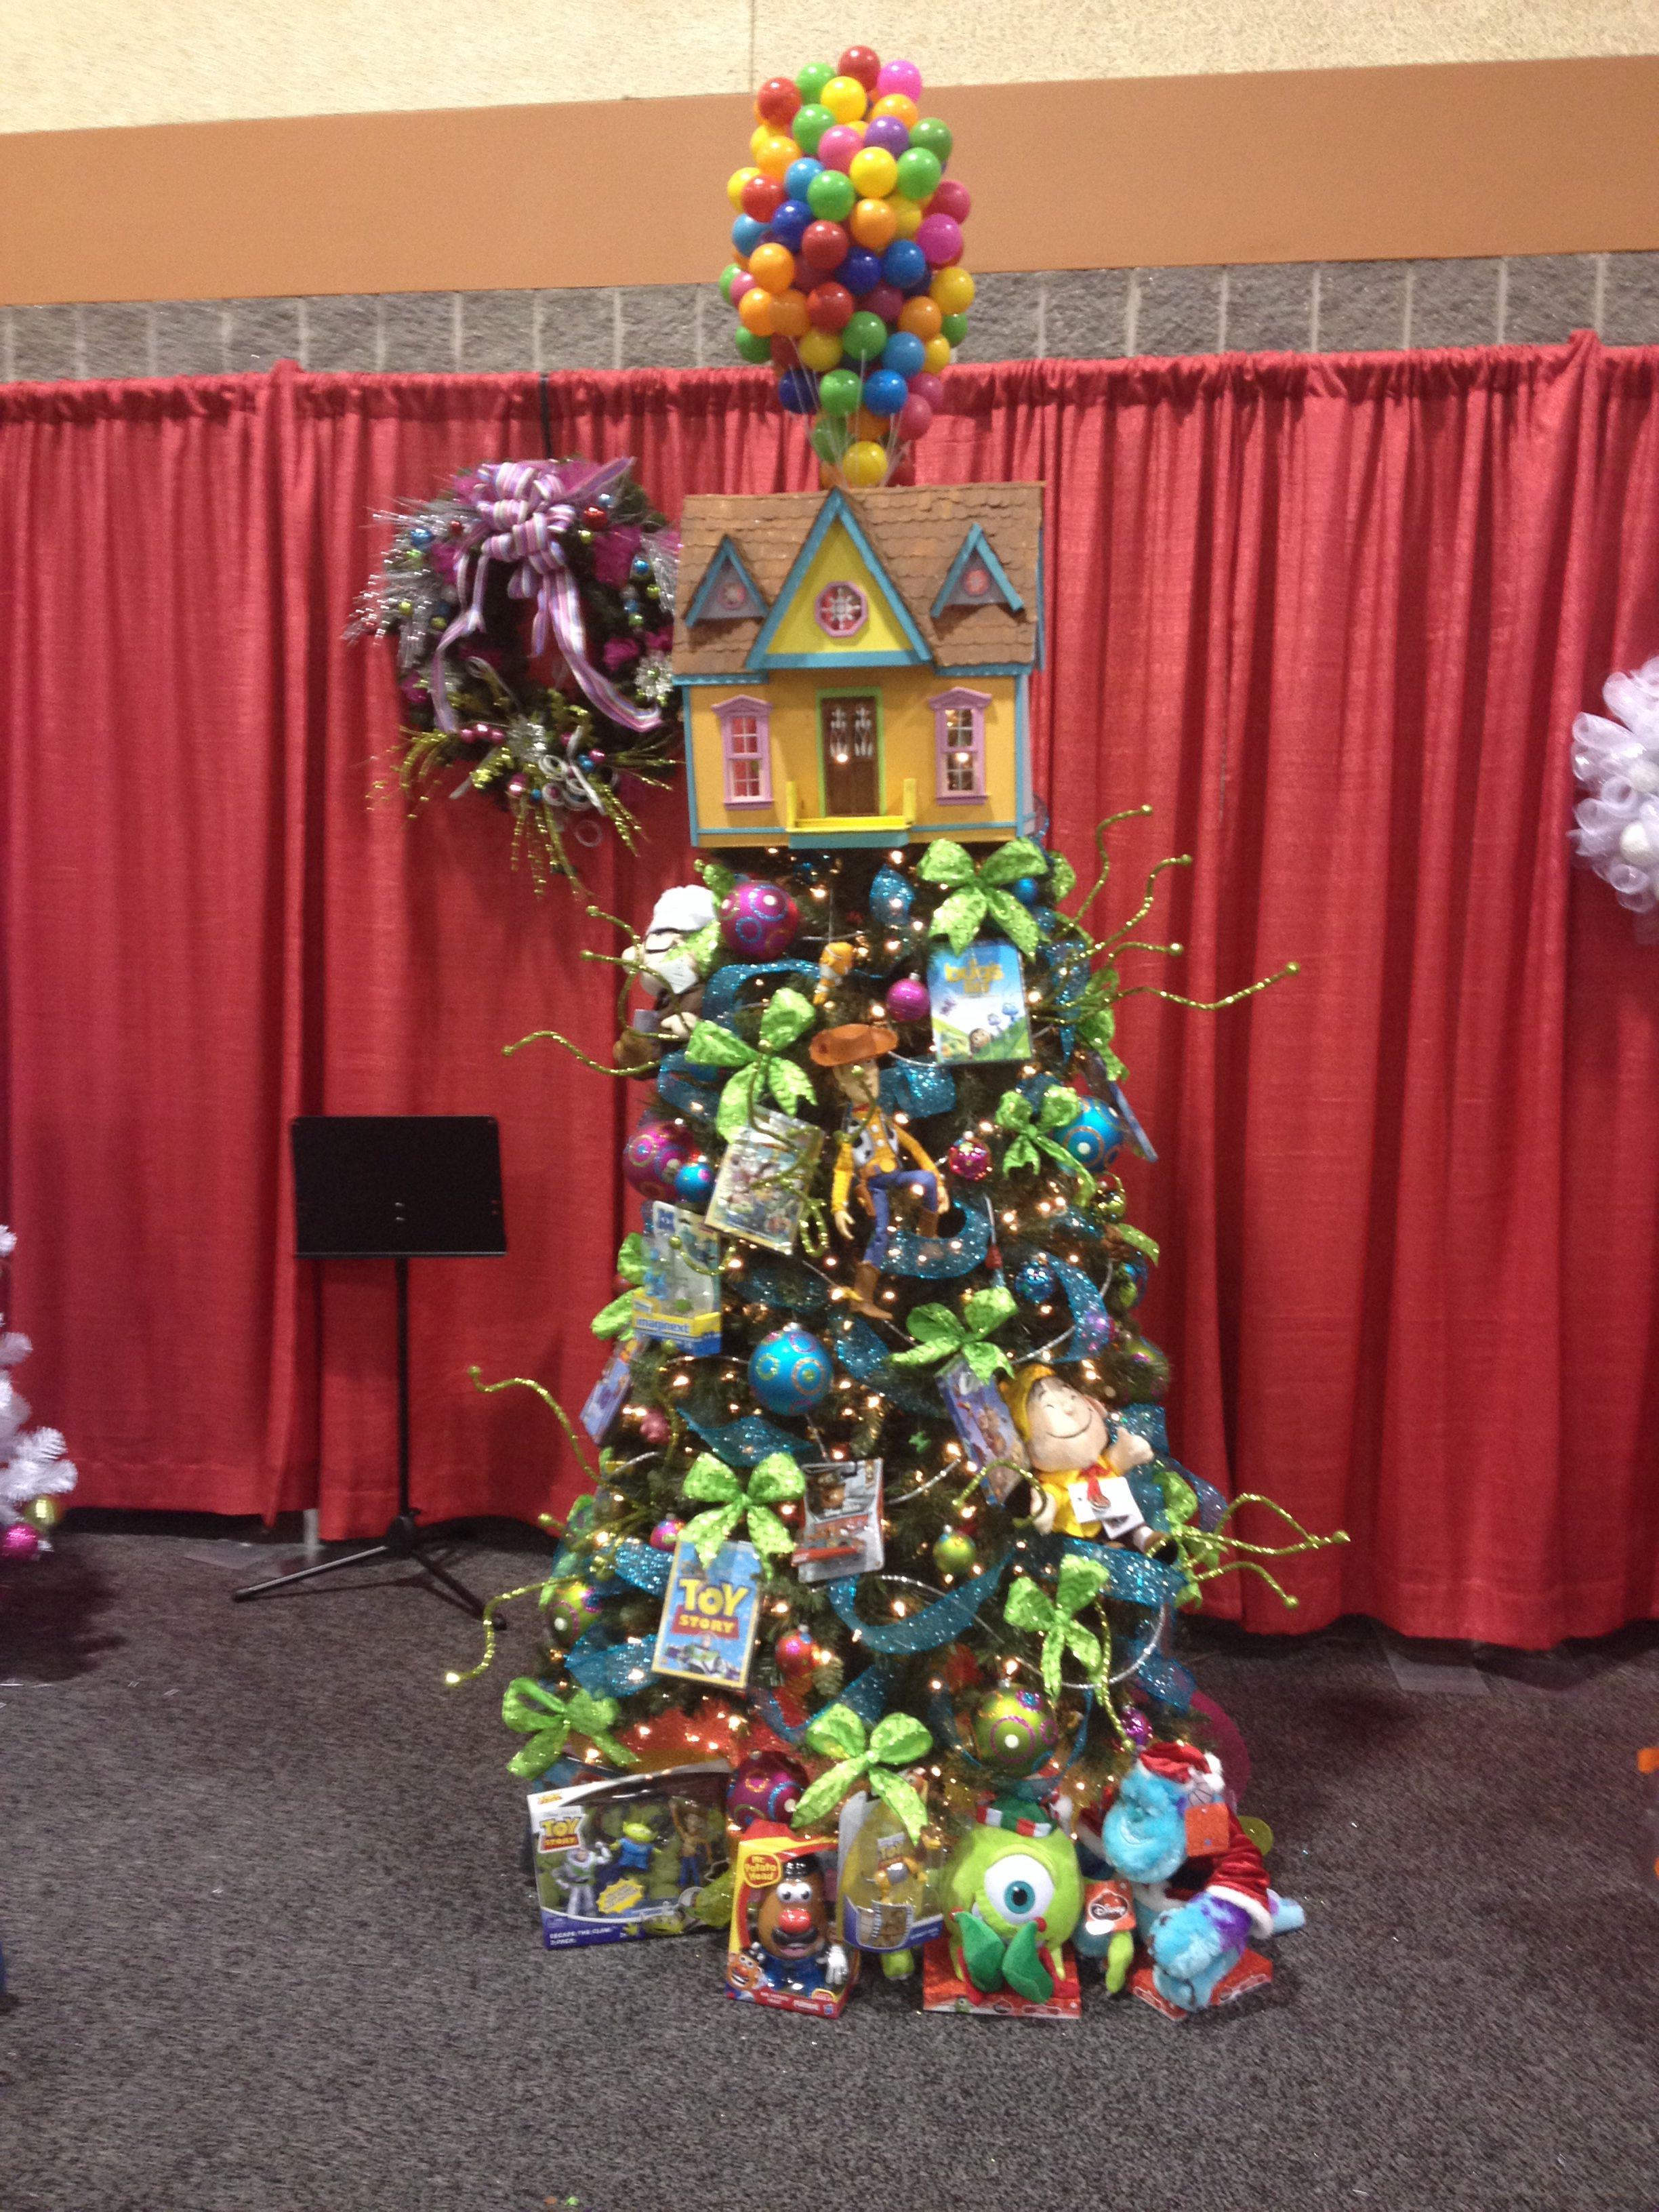 Disney Pixar themed Christmas tree